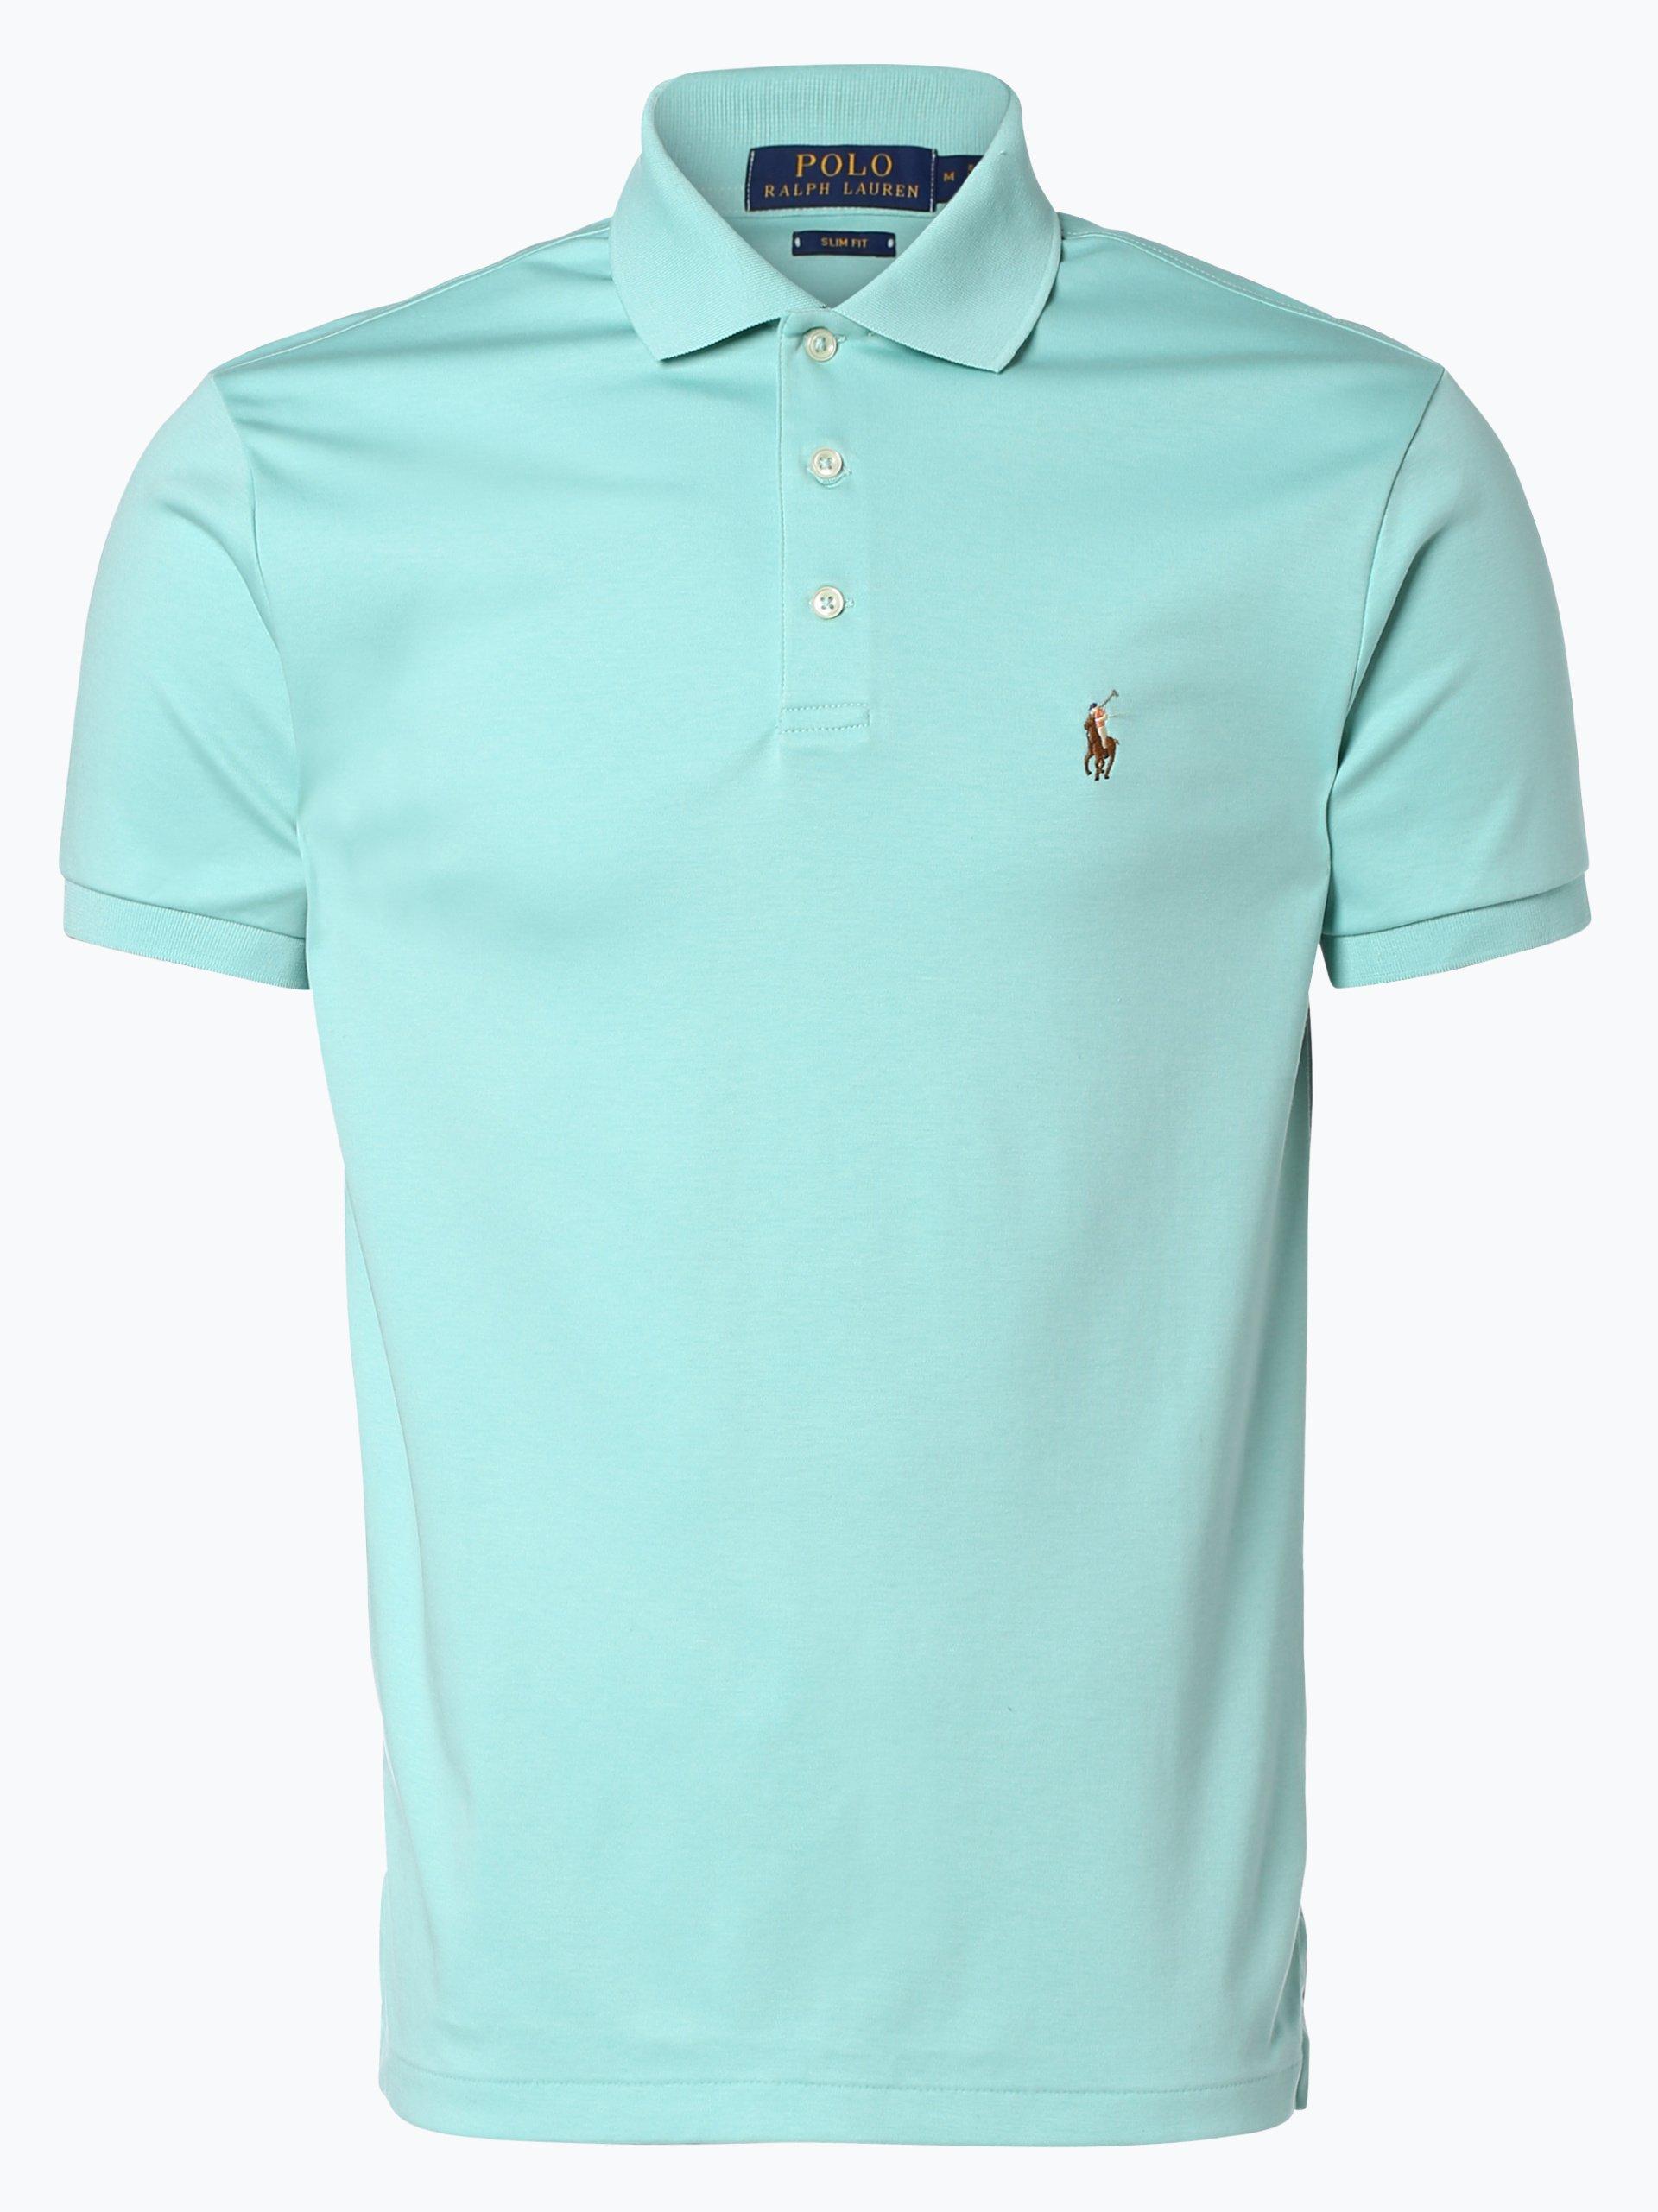 Polo Ralph Lauren Męska koszulka polo kup online  8b2acd2e387